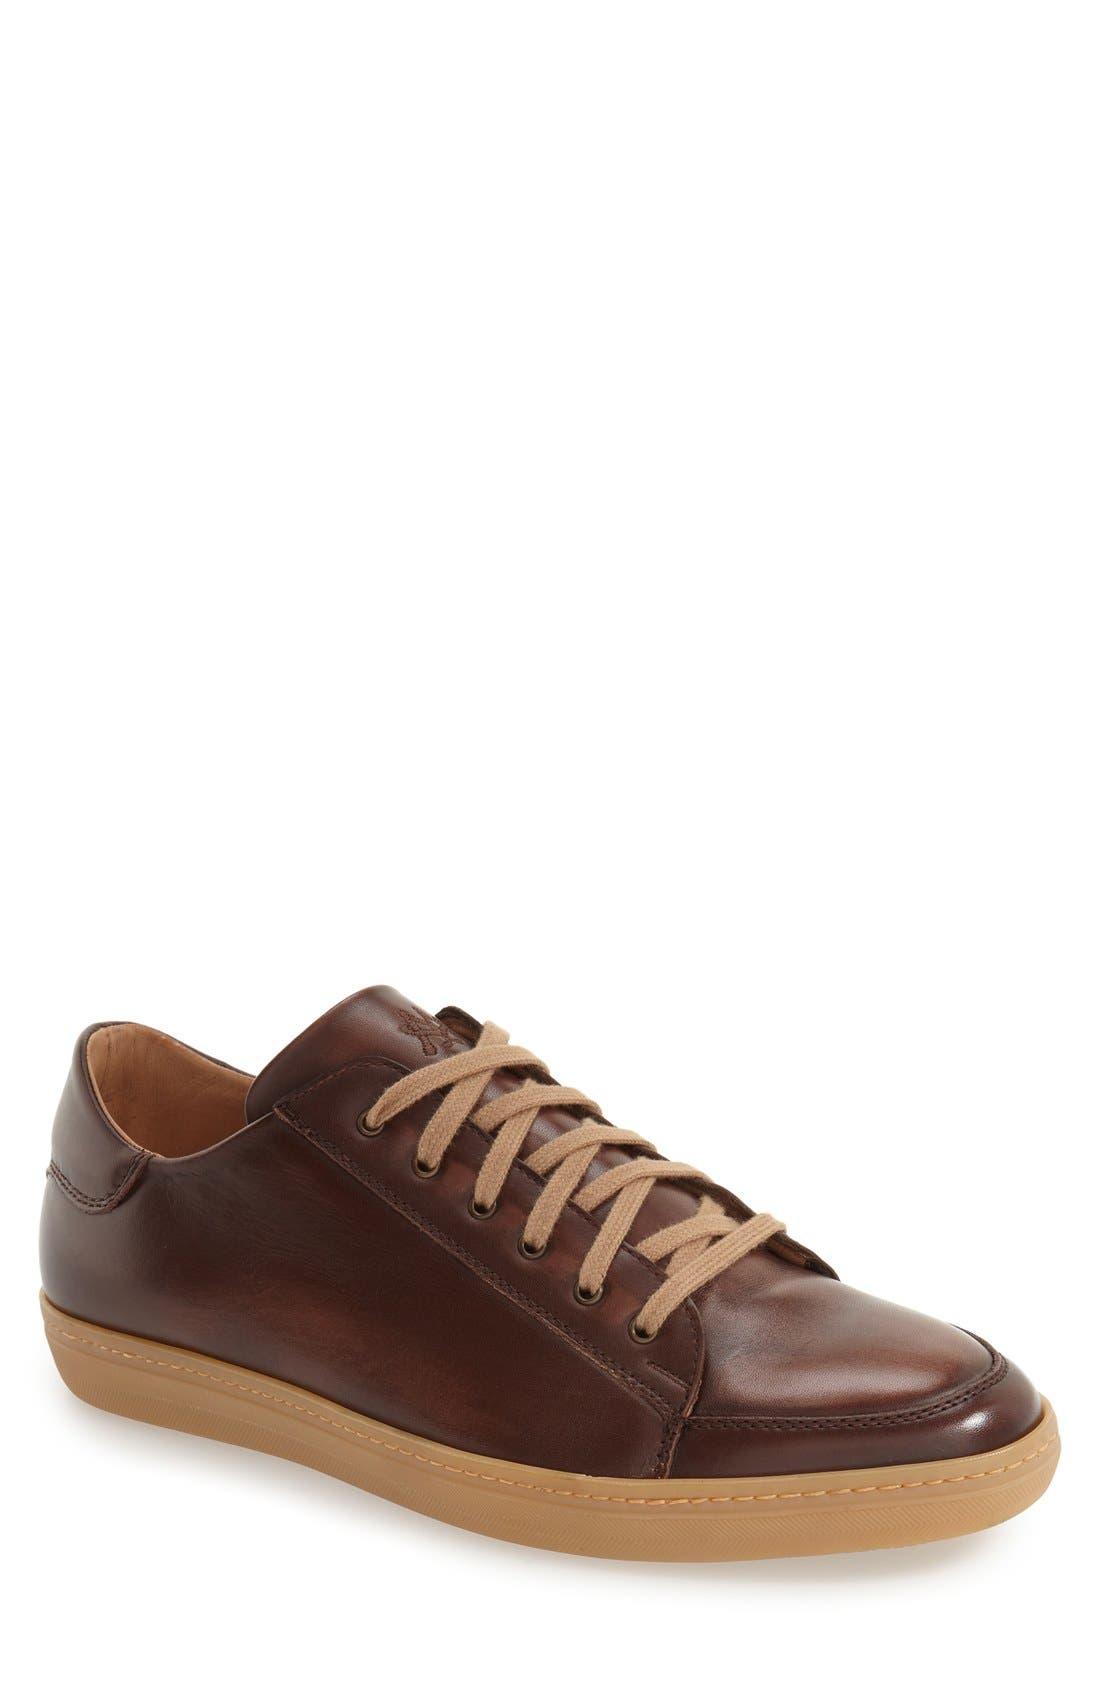 Alternate Image 1 Selected - Mezlan 'Masi' Lace-Up Sneaker (Men)